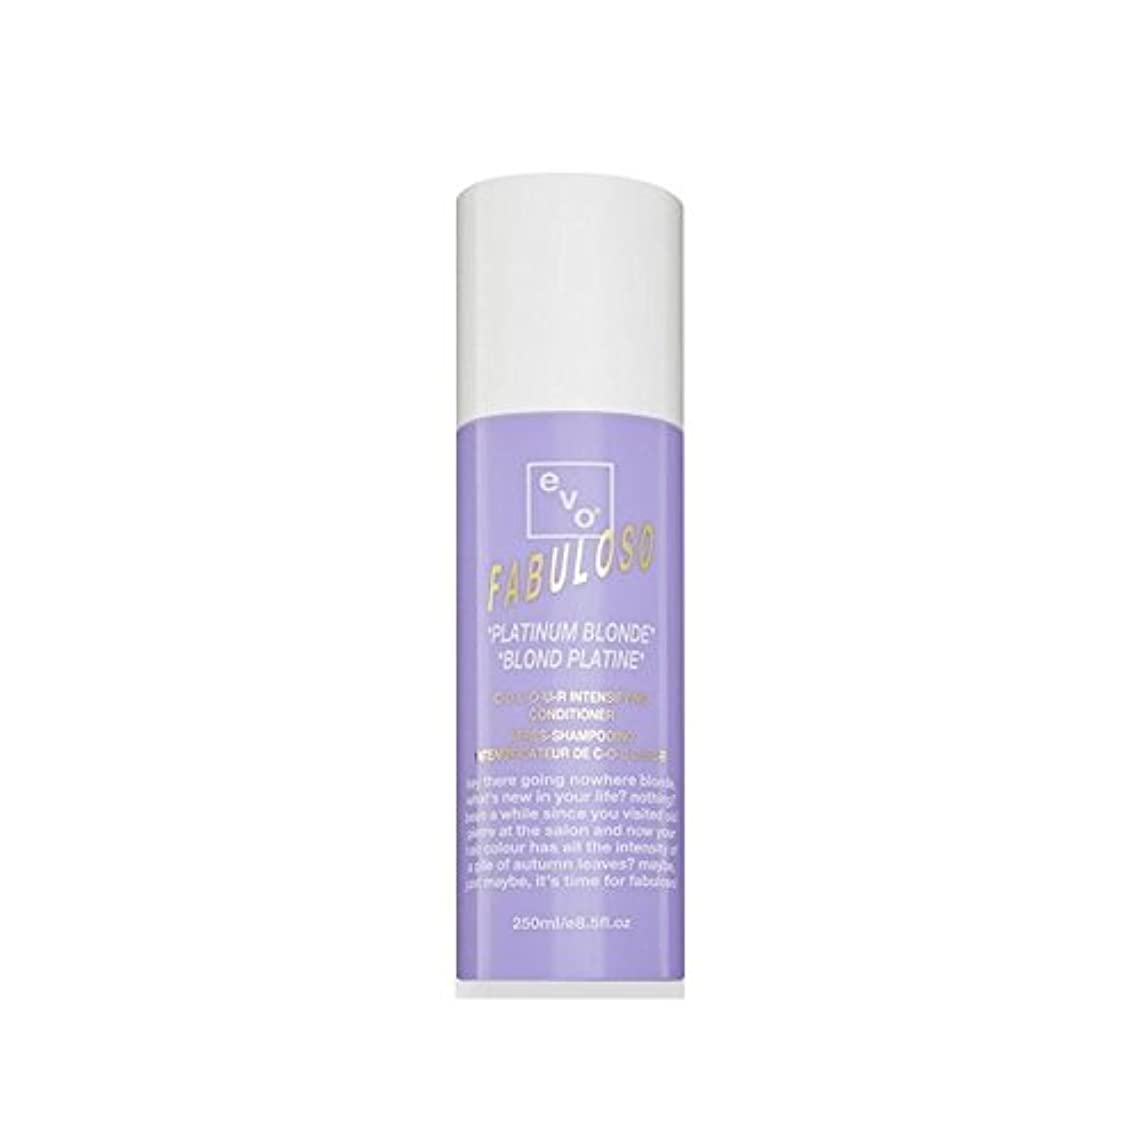 Evo Fabuloso Colour Intensifying Conditioner Platinum Blonde (250ml) - 色増コンディショナープラチナブロンド(250ミリリットル) [並行輸入品]